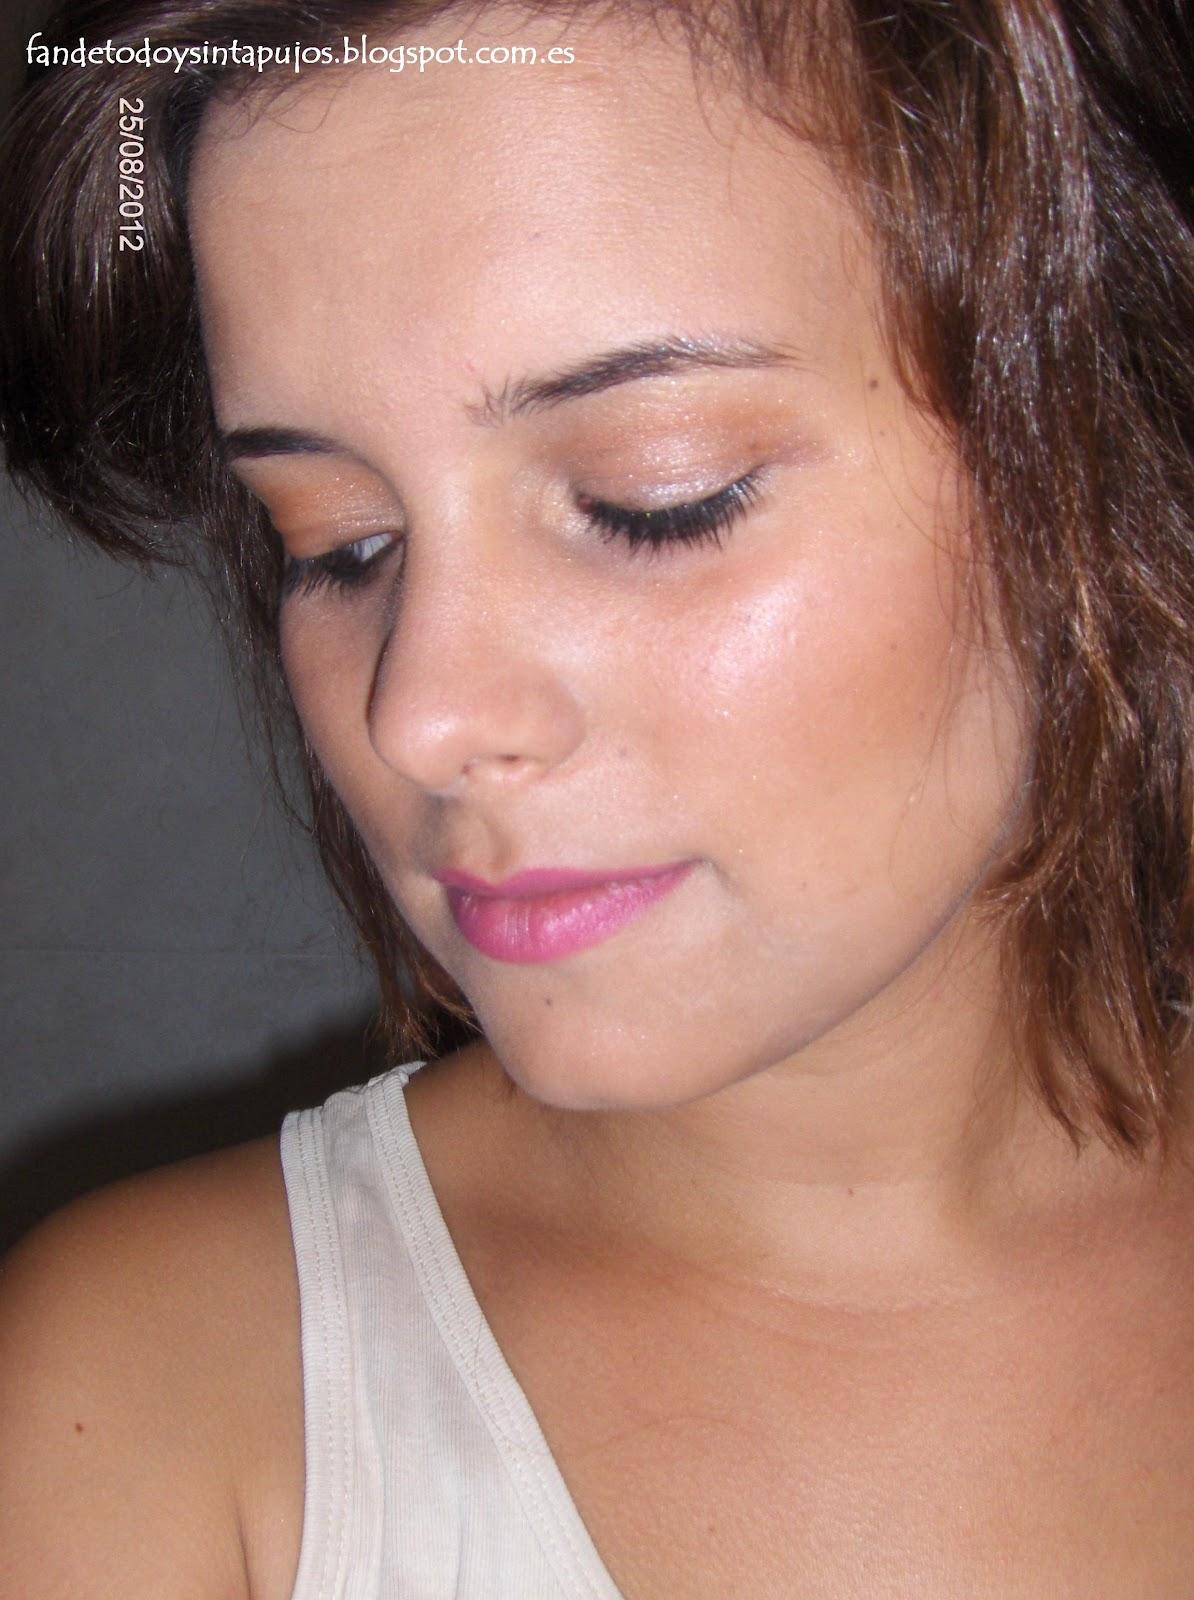 http://3.bp.blogspot.com/-iOKkXQUvN3Y/UDkuDfq_3JI/AAAAAAAAAFk/5z_wcntDyjk/s1600/HPIM2860+1.JPG